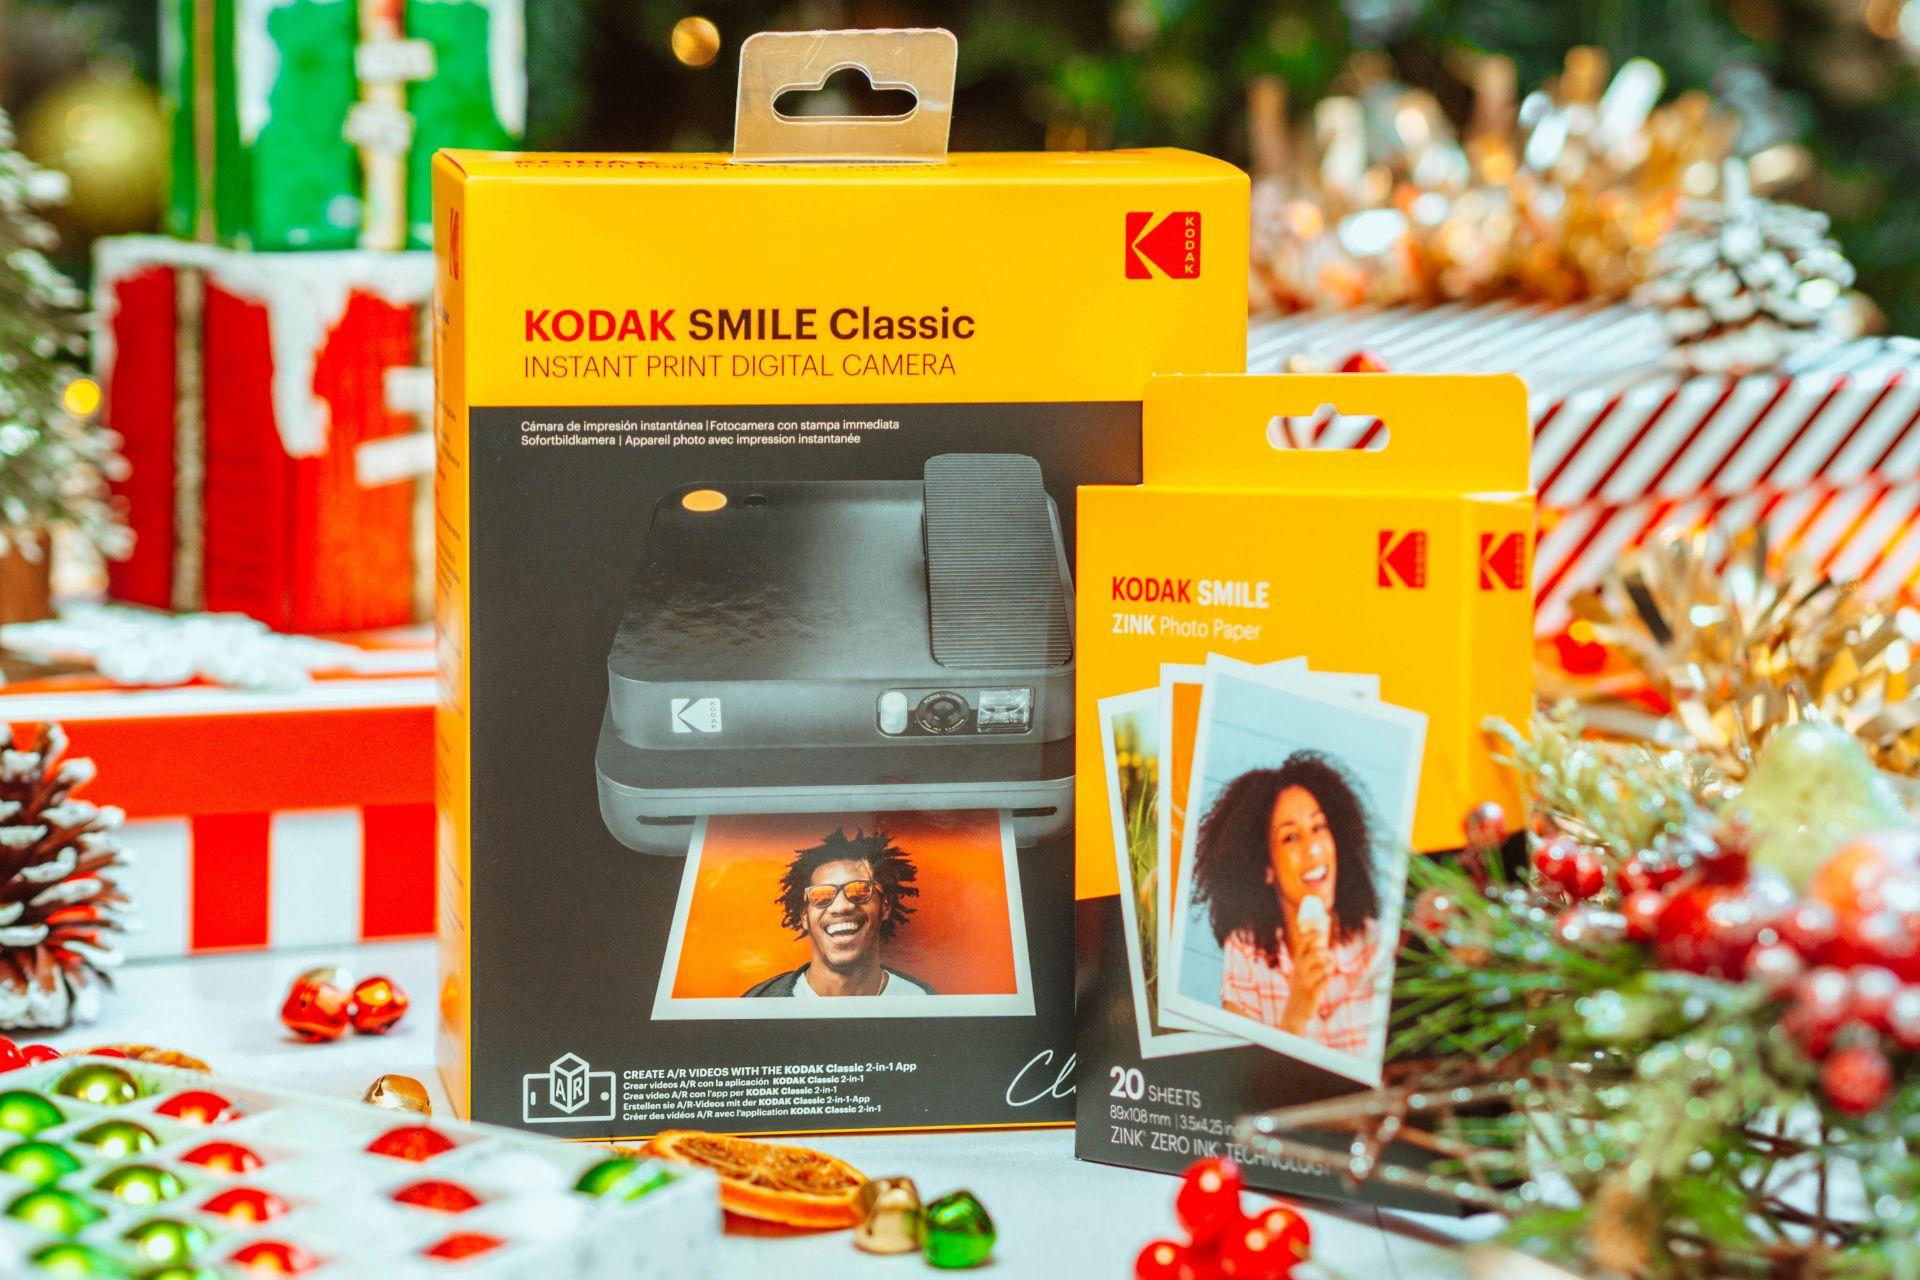 KODAK SMILE Classic Digital Instant Camera